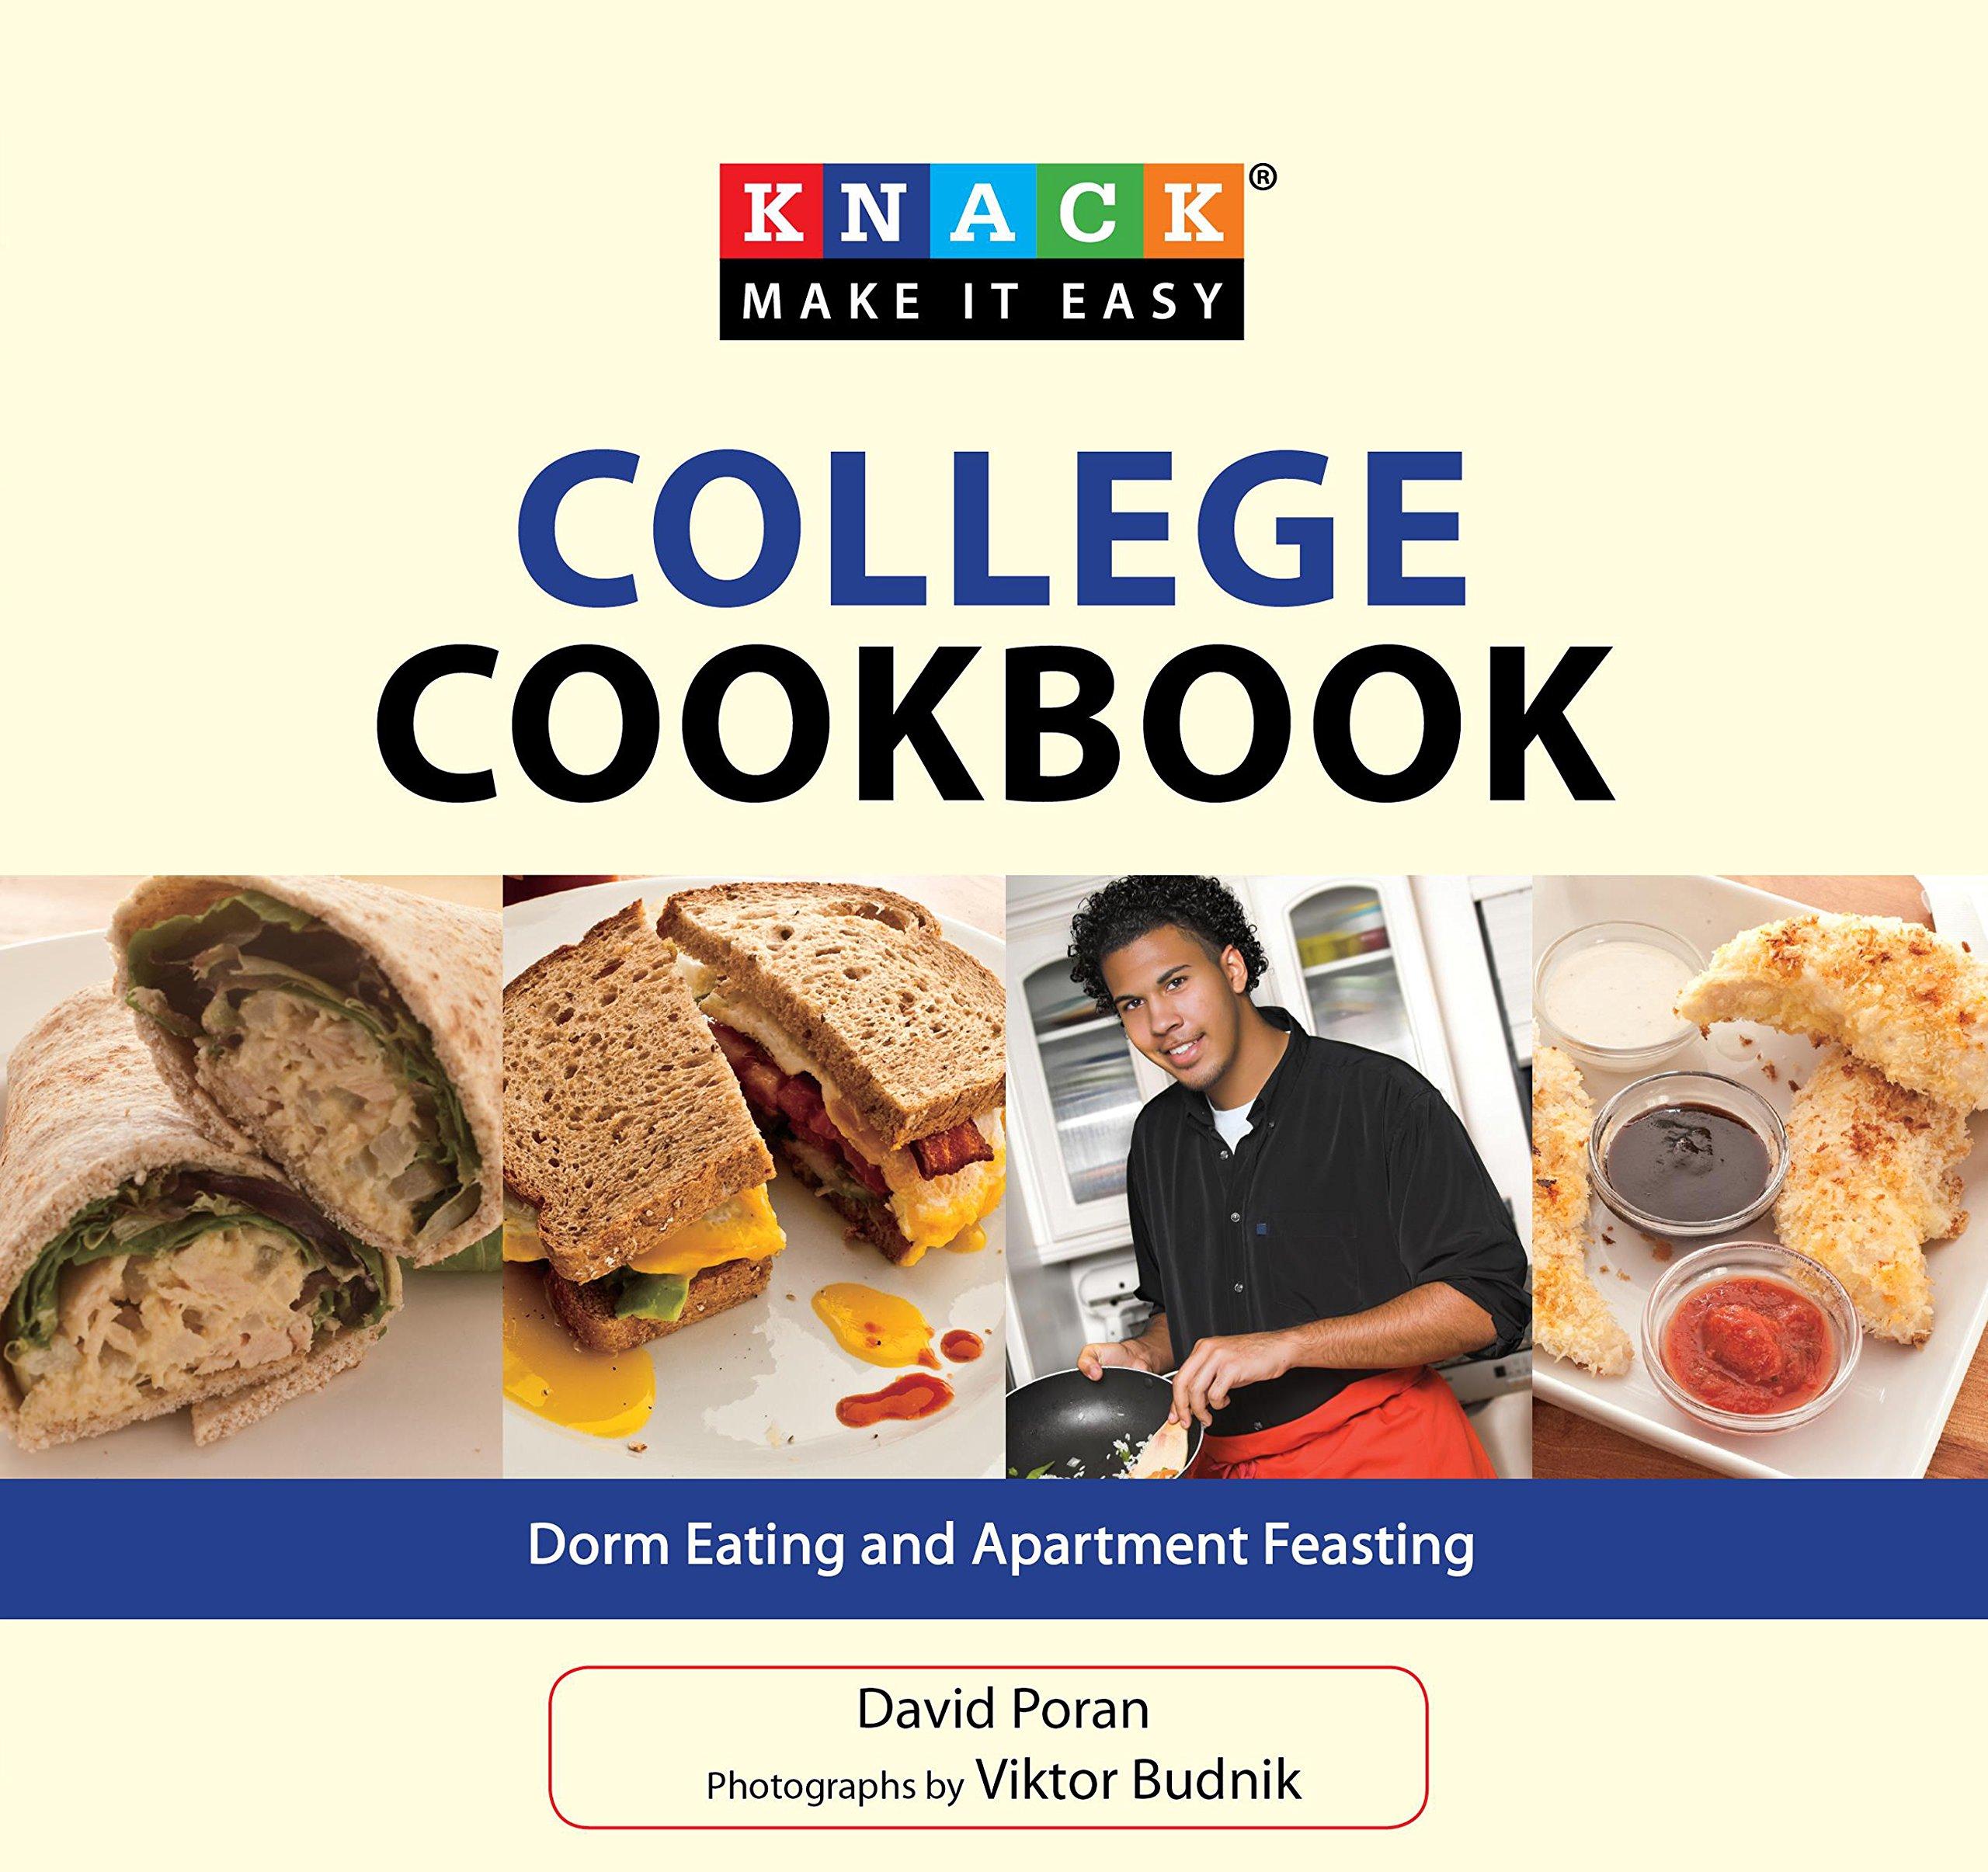 Knack College Cookbook: Dorm Eating and Apartment Feasting (Knack: Make It easy) pdf